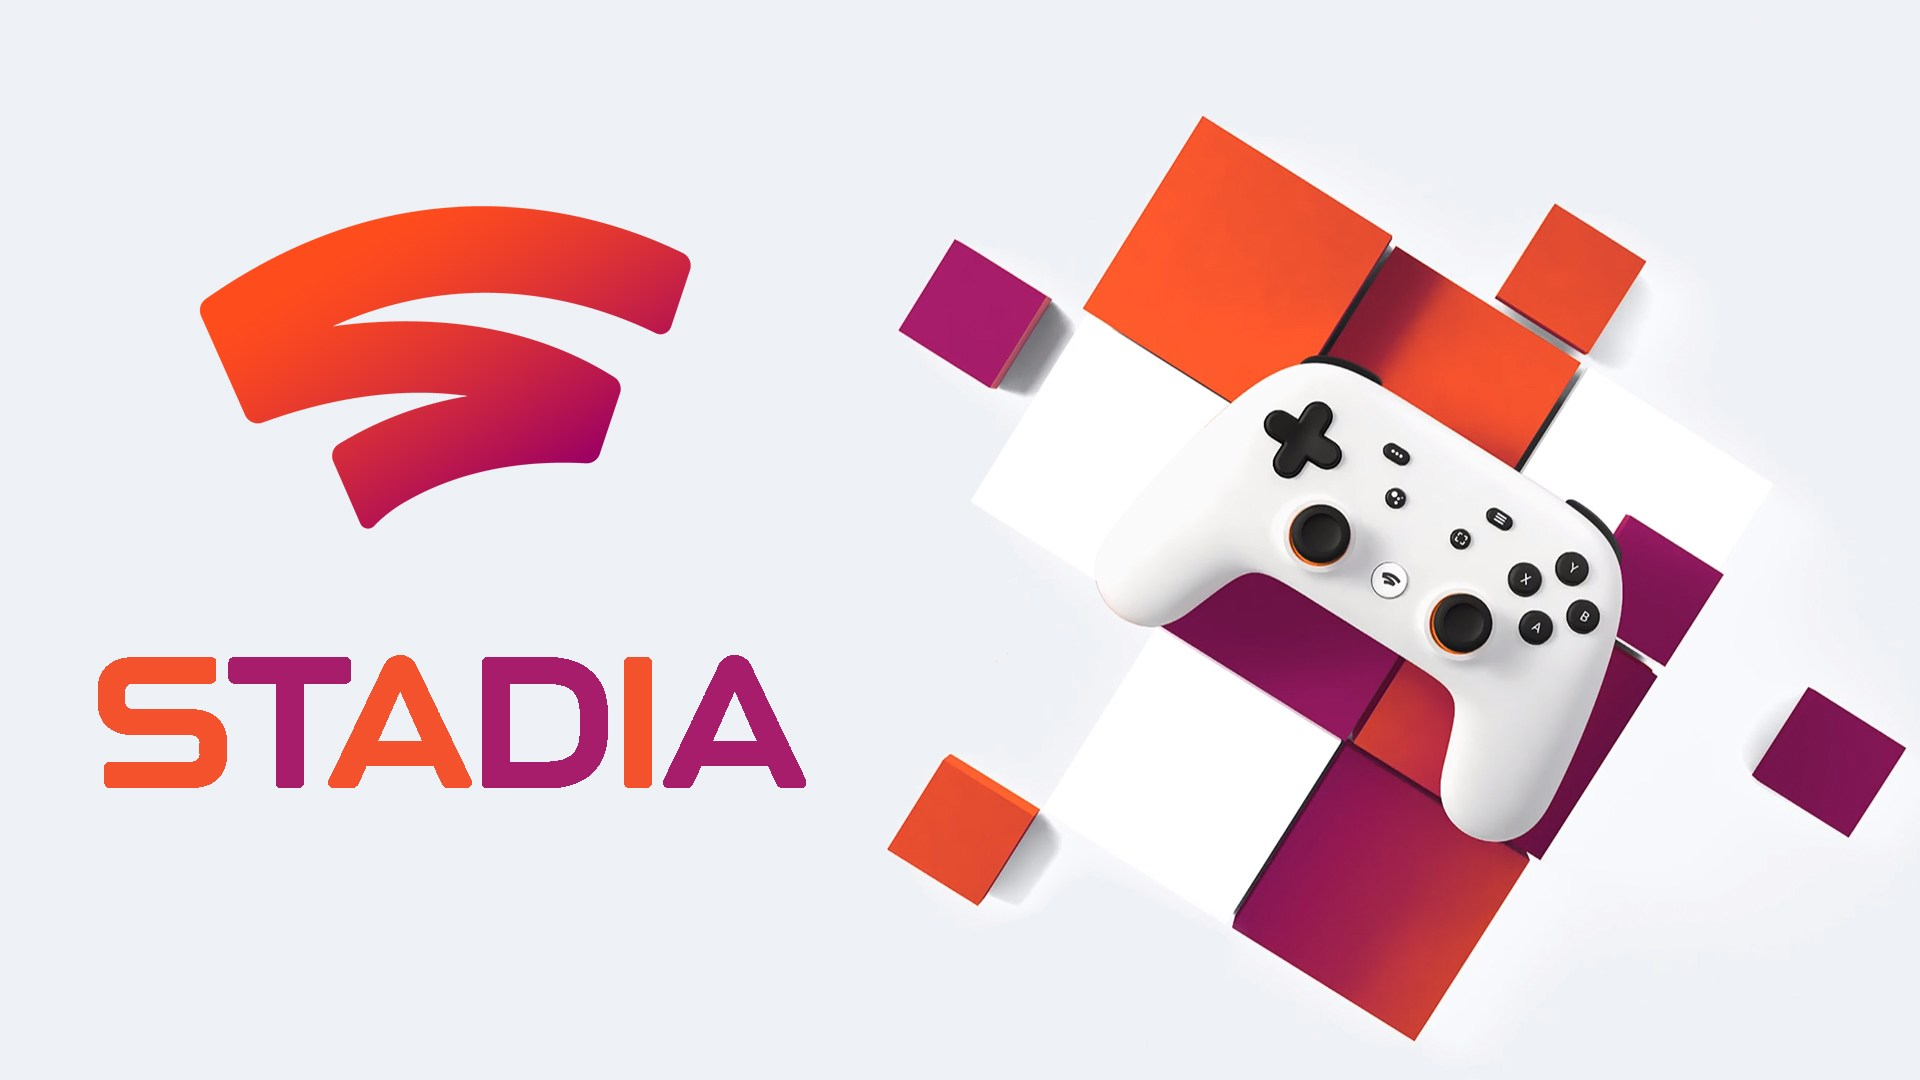 Stadia、Googleは批判に応える»ビデオゲームについて話しましょう